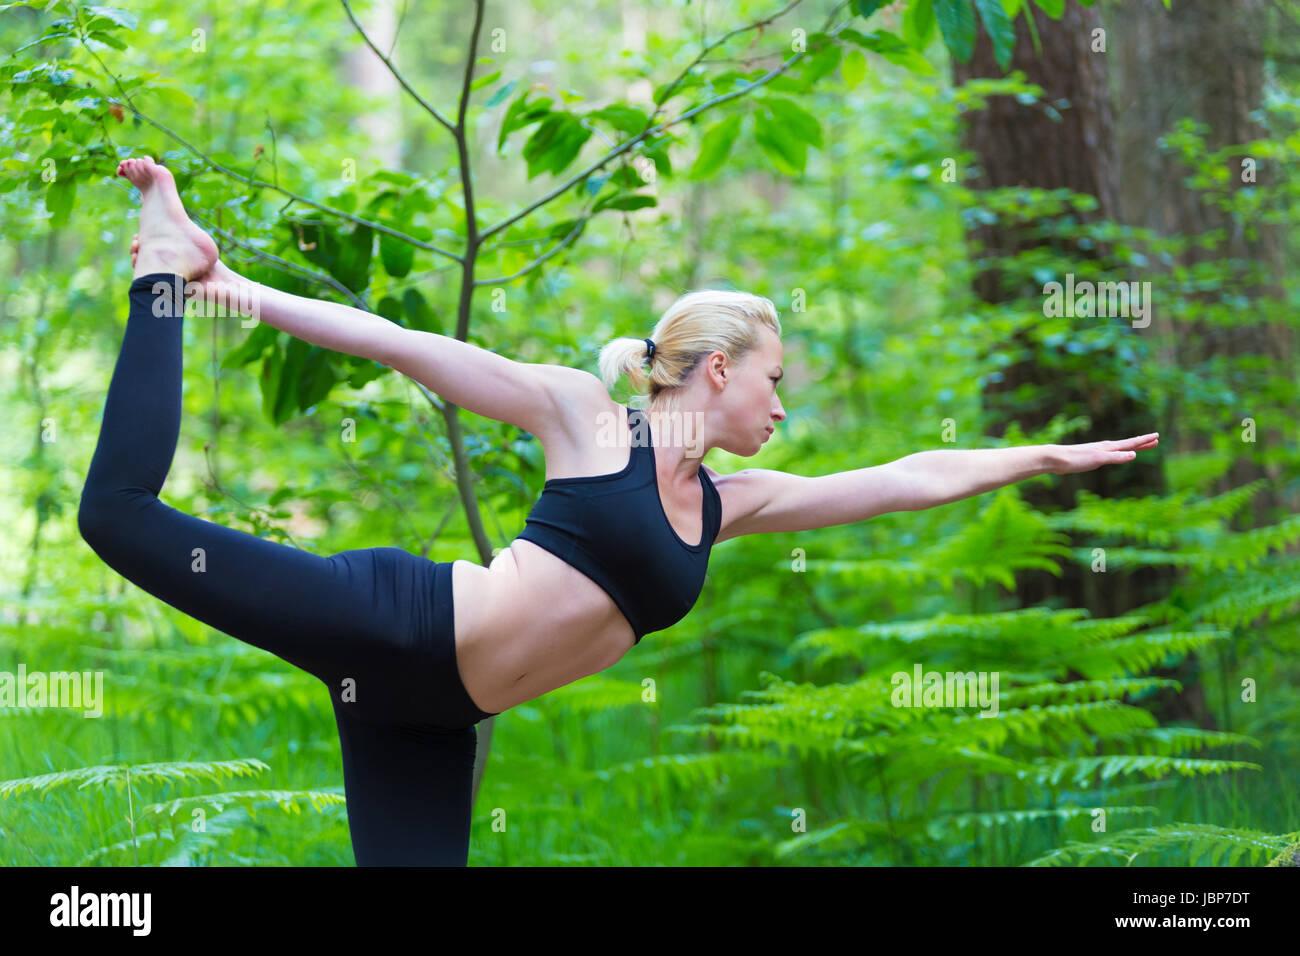 Bikram Yoga High Resolution Stock Photography And Images Alamy